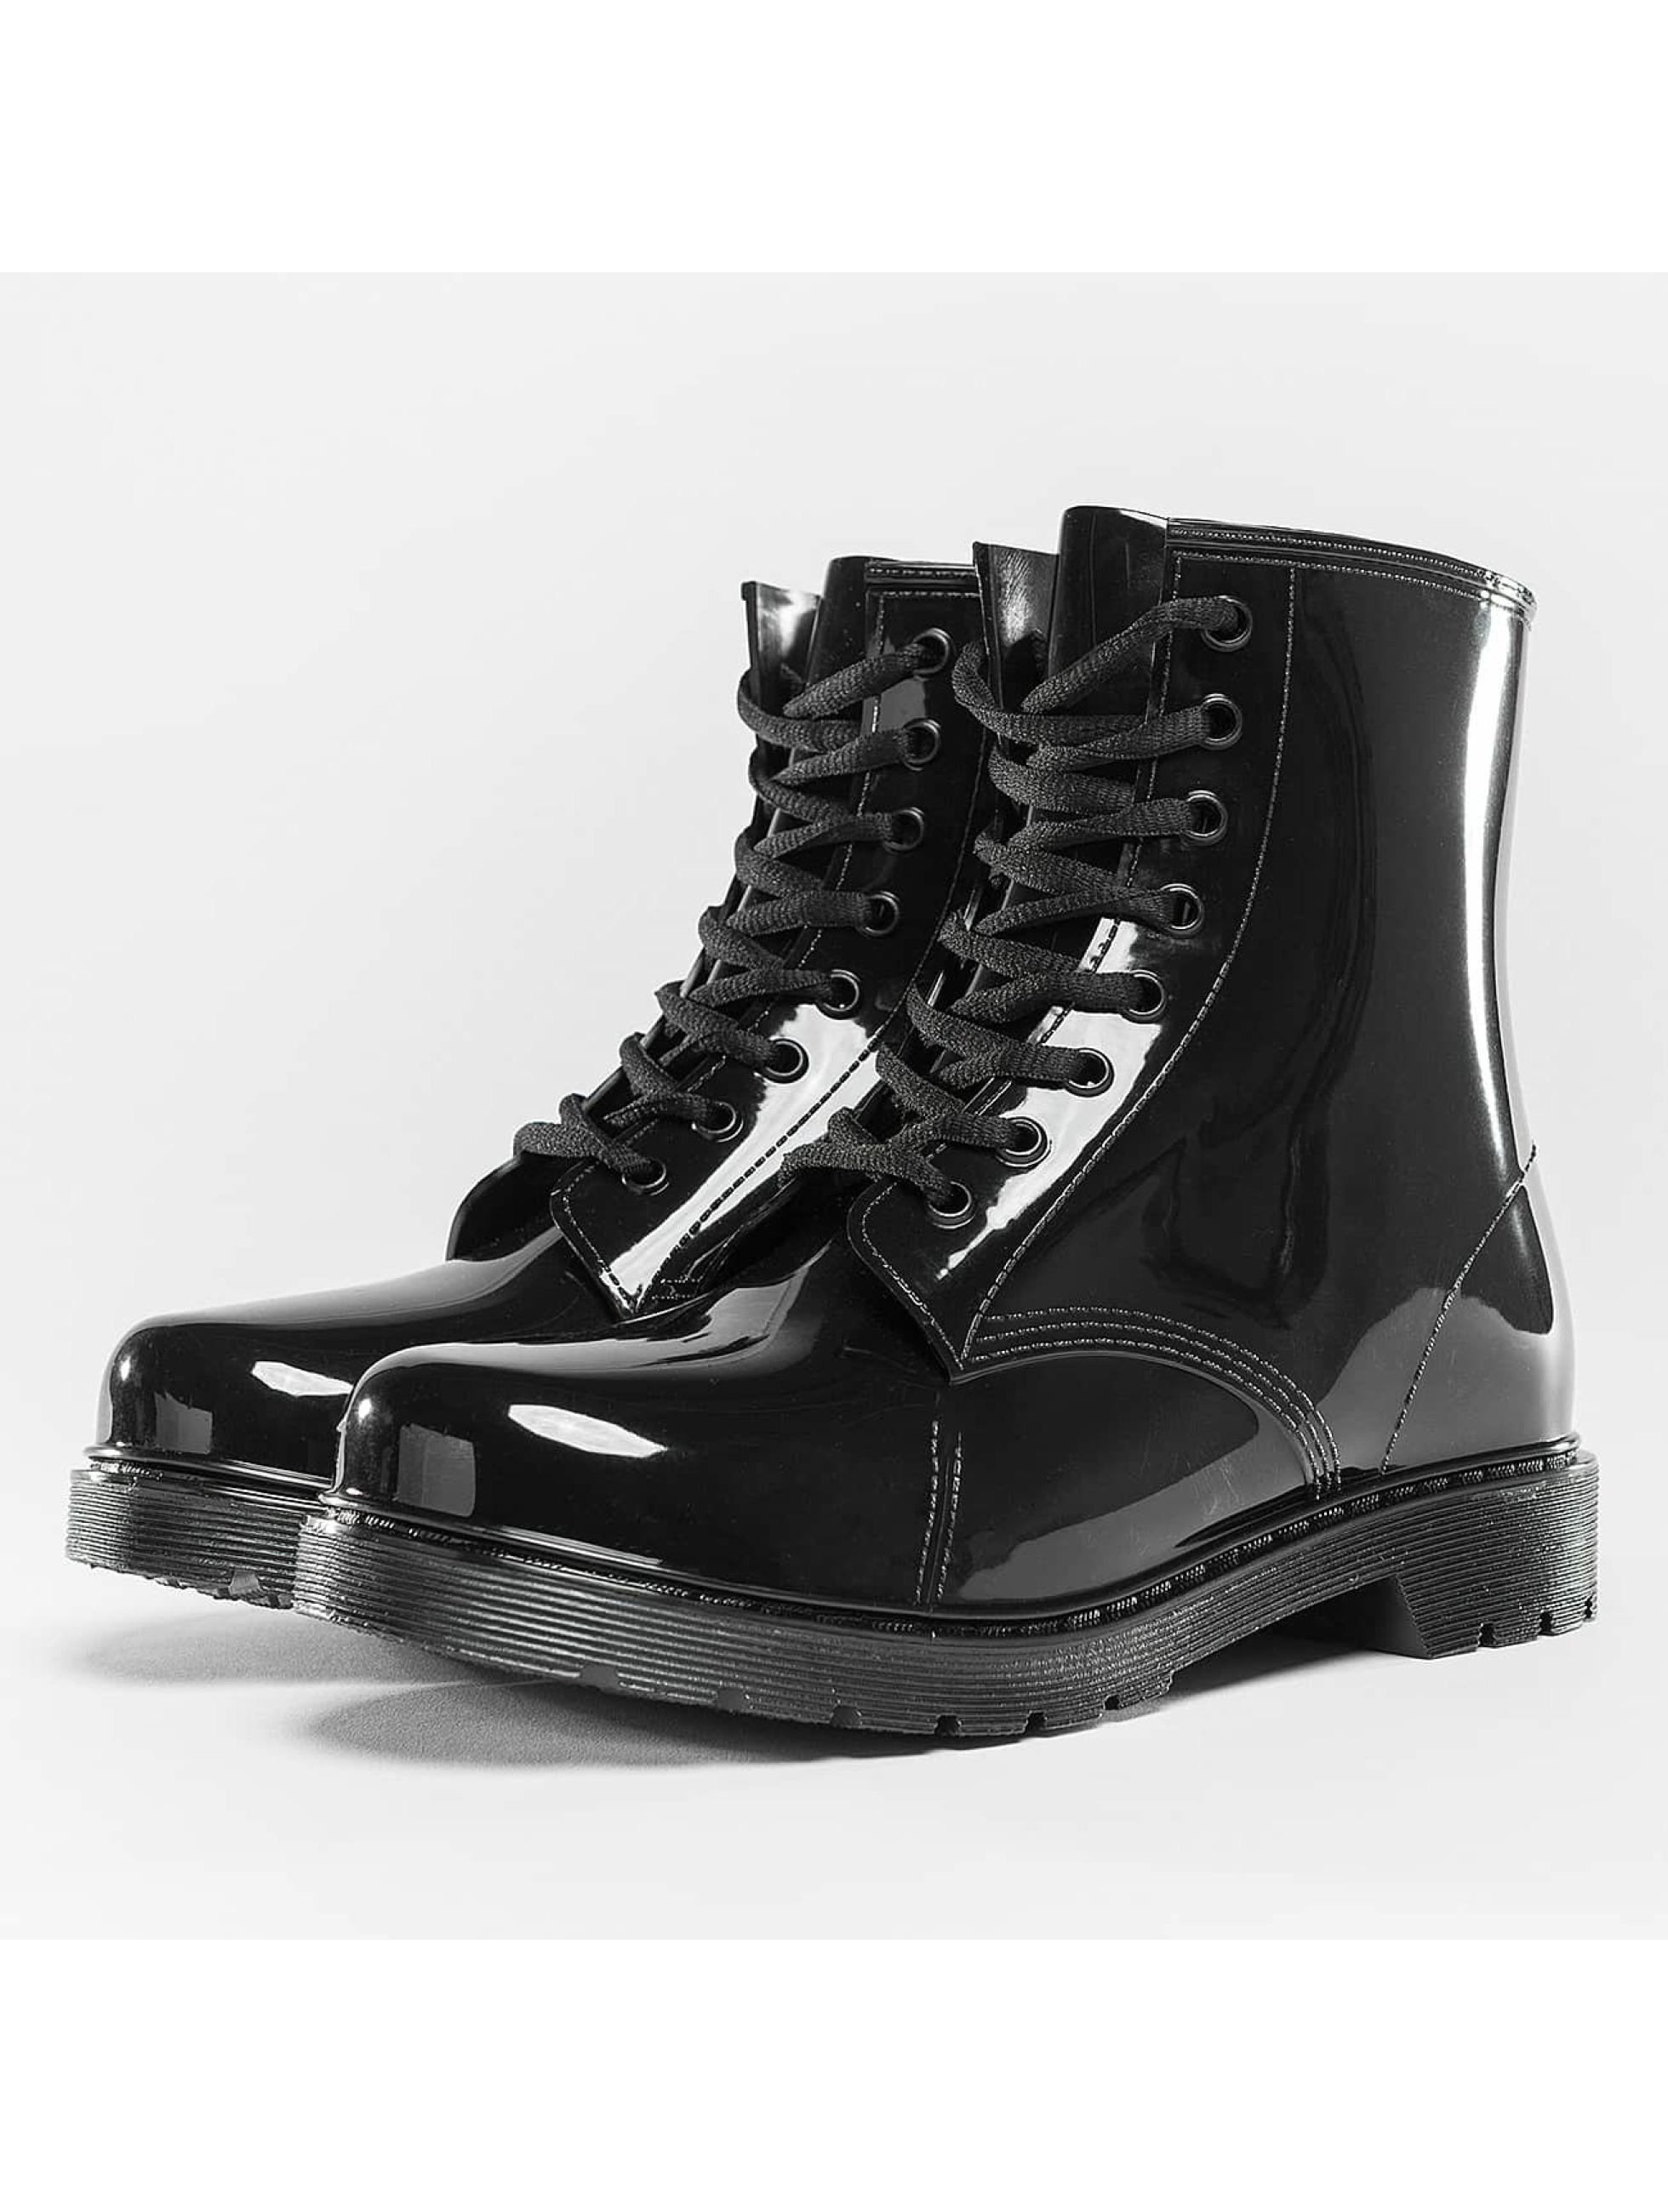 Urban Classics Frauen Boots Laced Rain in schwarz